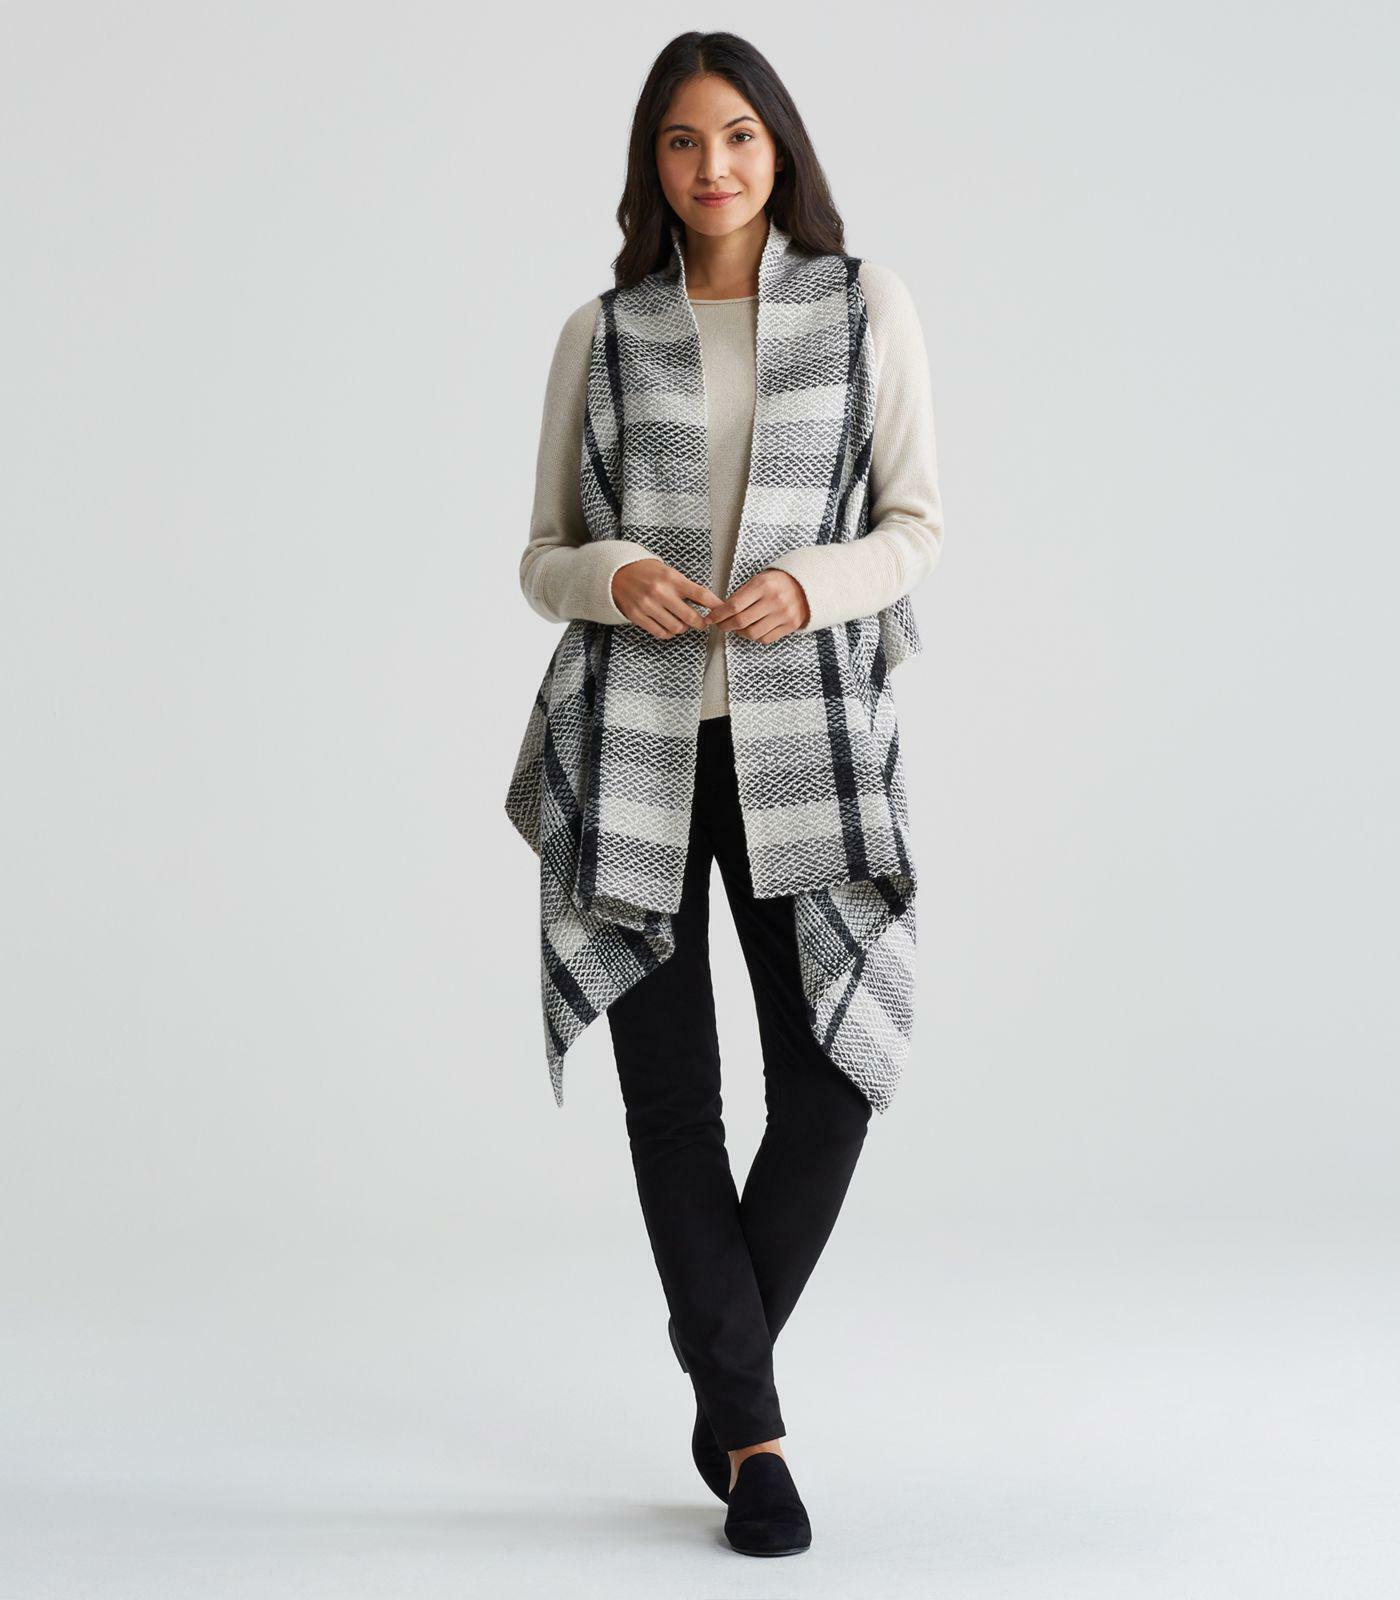 8f0d86ded Nwt's Eileen Peruvian M S Vest Alpaca Cotton Organic Handwoven ...